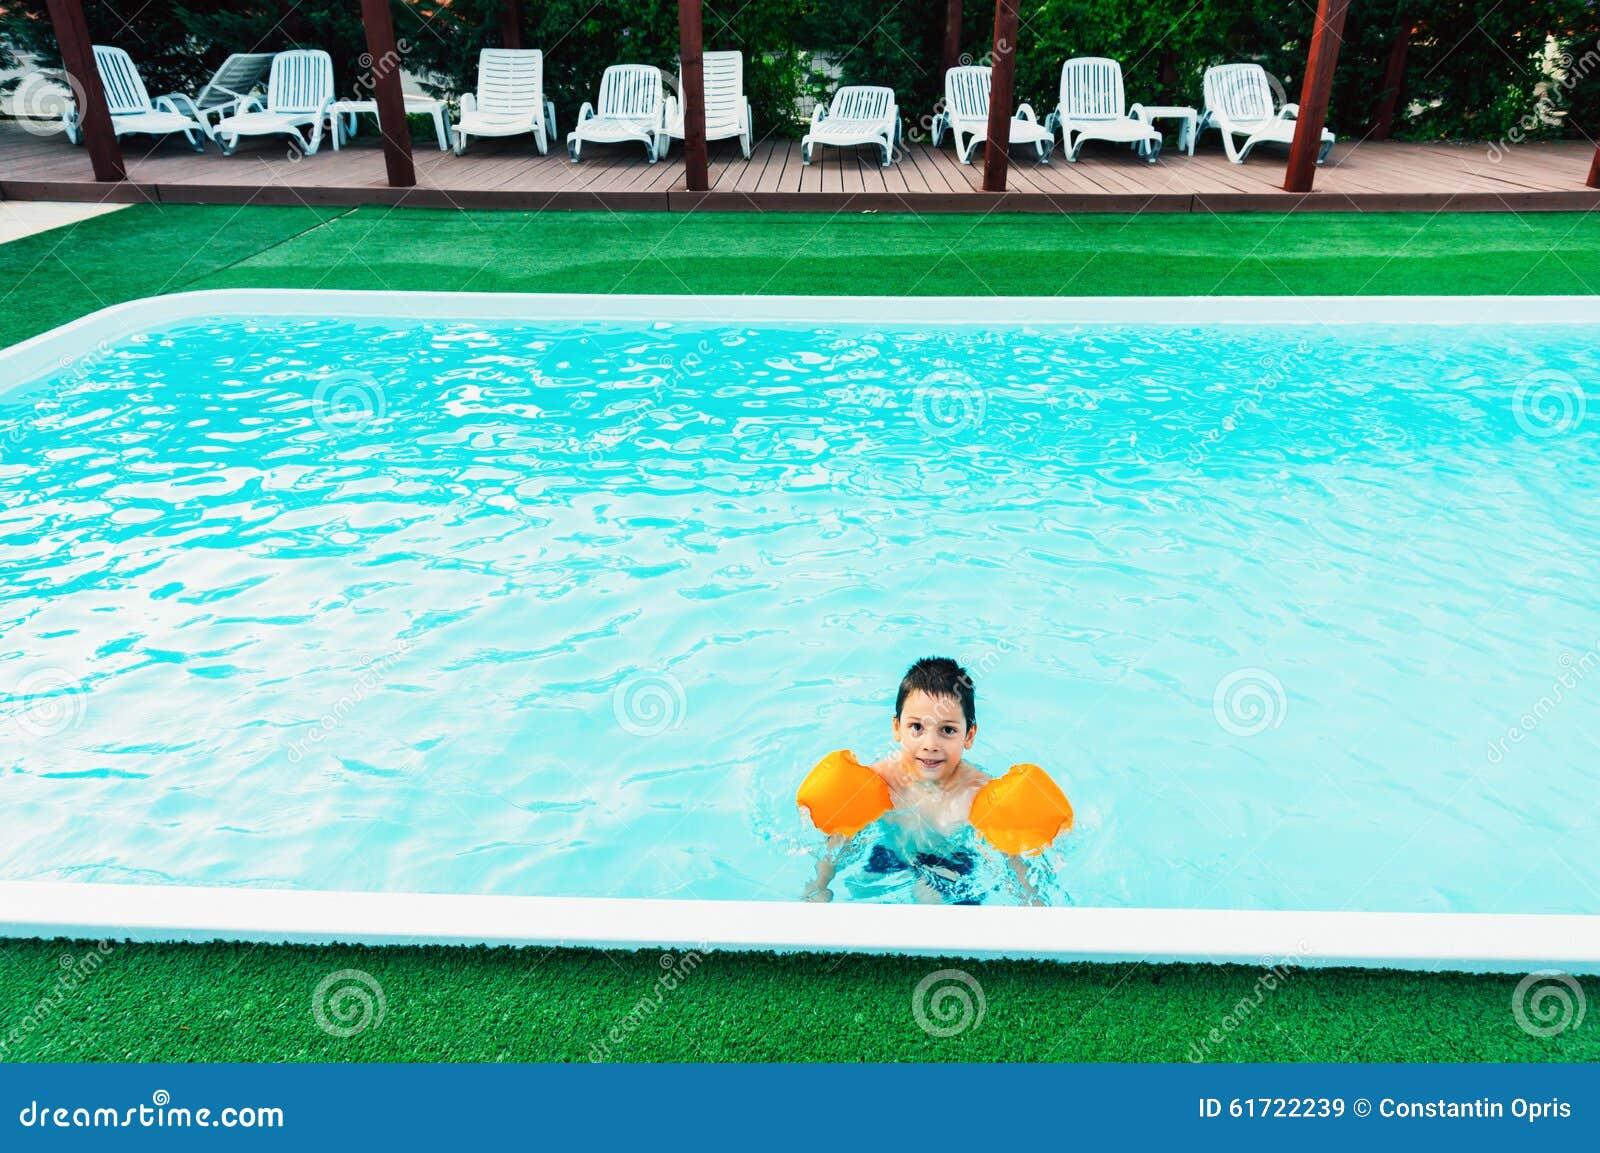 Swimming Pool Wings : Boy in swimming pool stock photo image